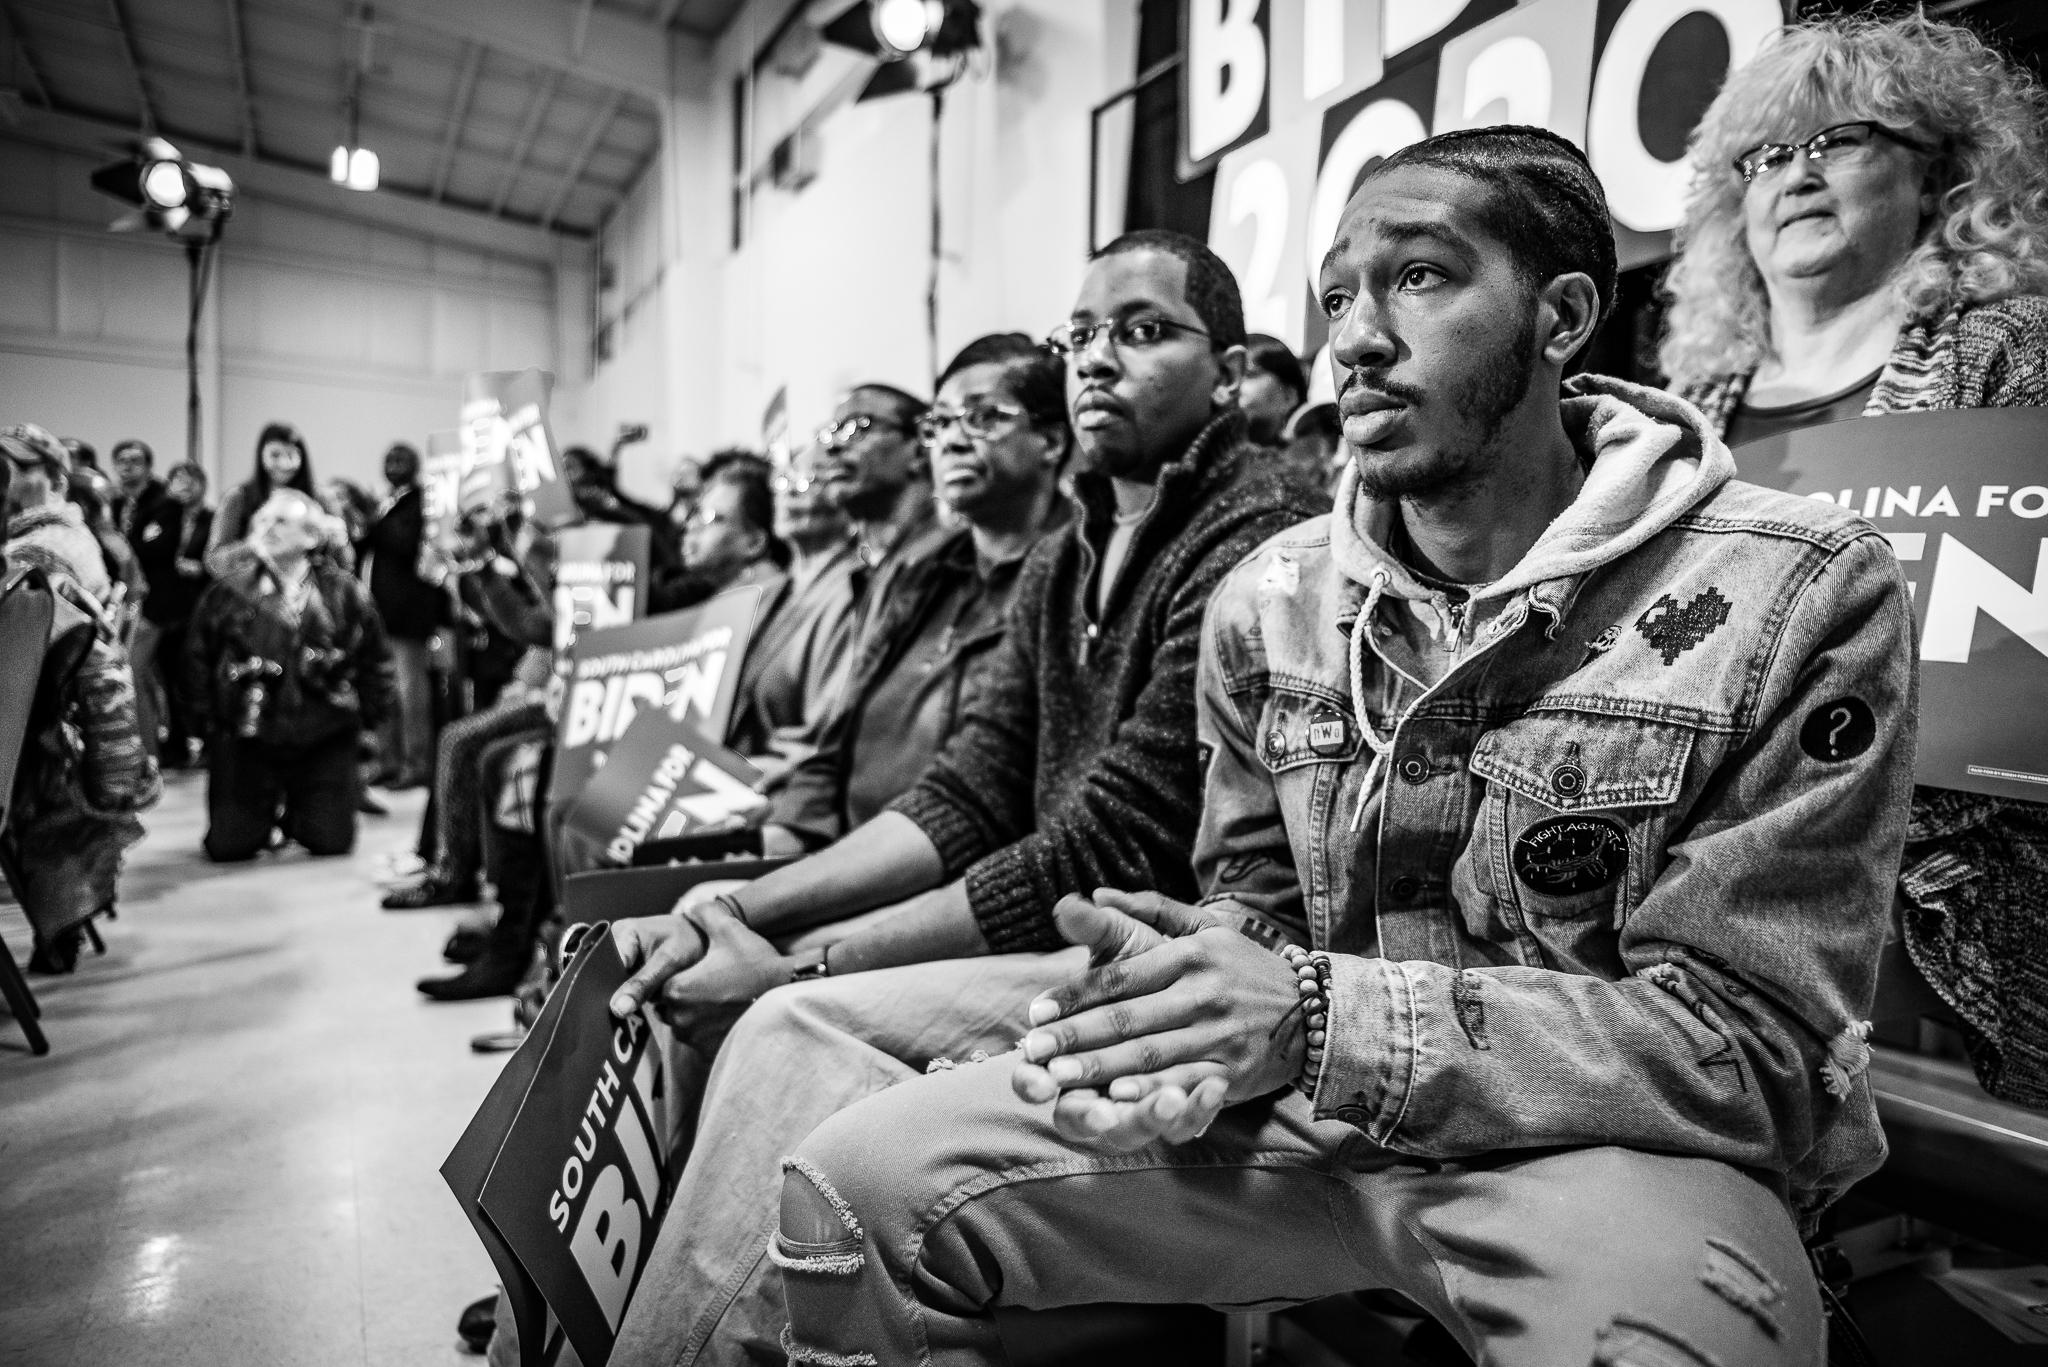 Supporters in Sumter South, Carolina look on as Joe Biden gives a stump speech. February 28, 2020. Photo: Lance Monotone.